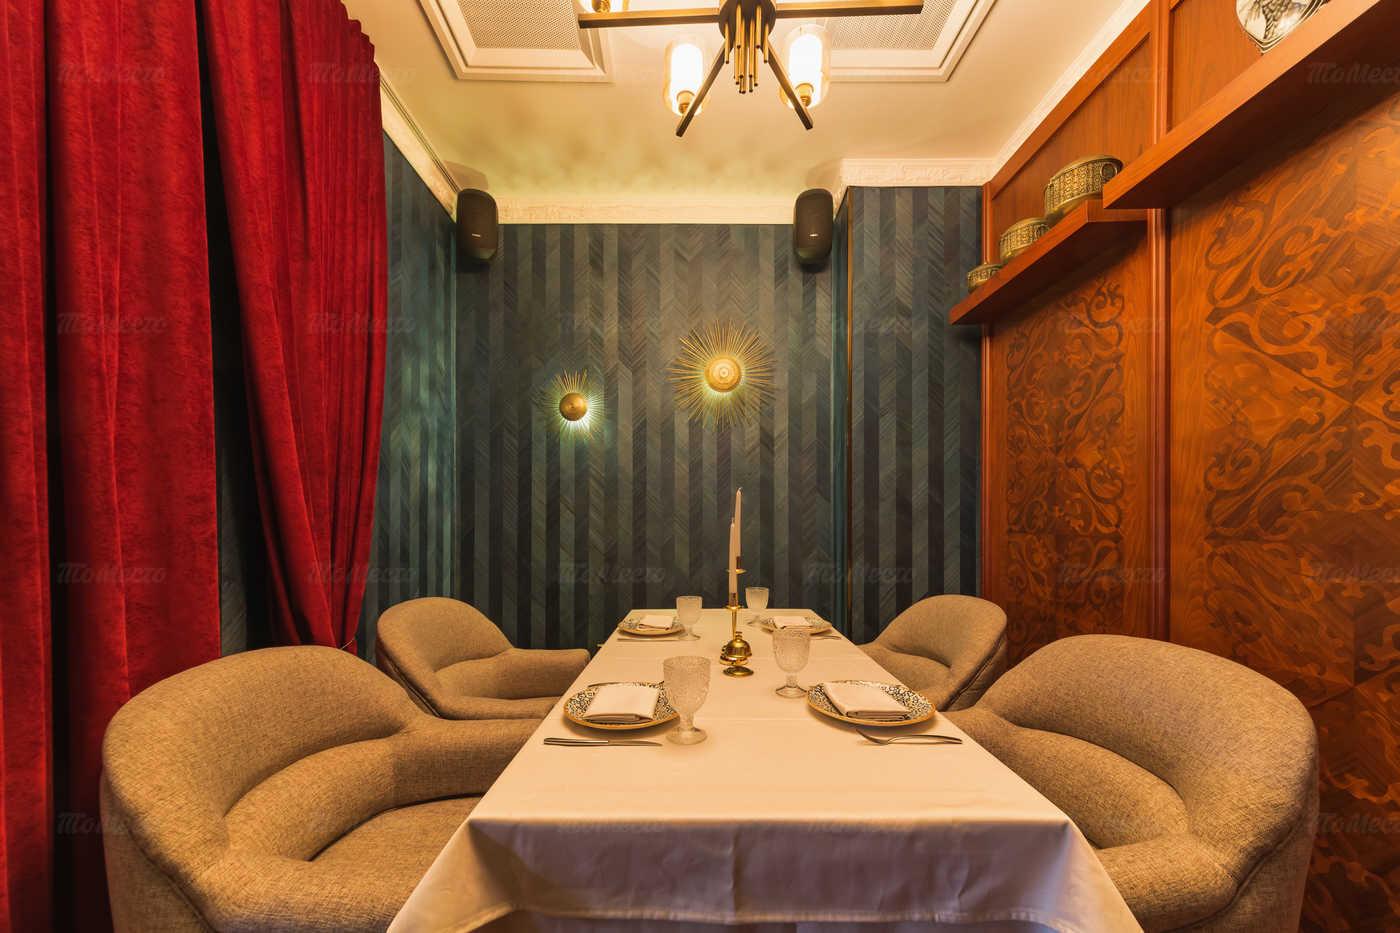 Ресторан Левантин (Levantine) на Новинском бульваре фото 24